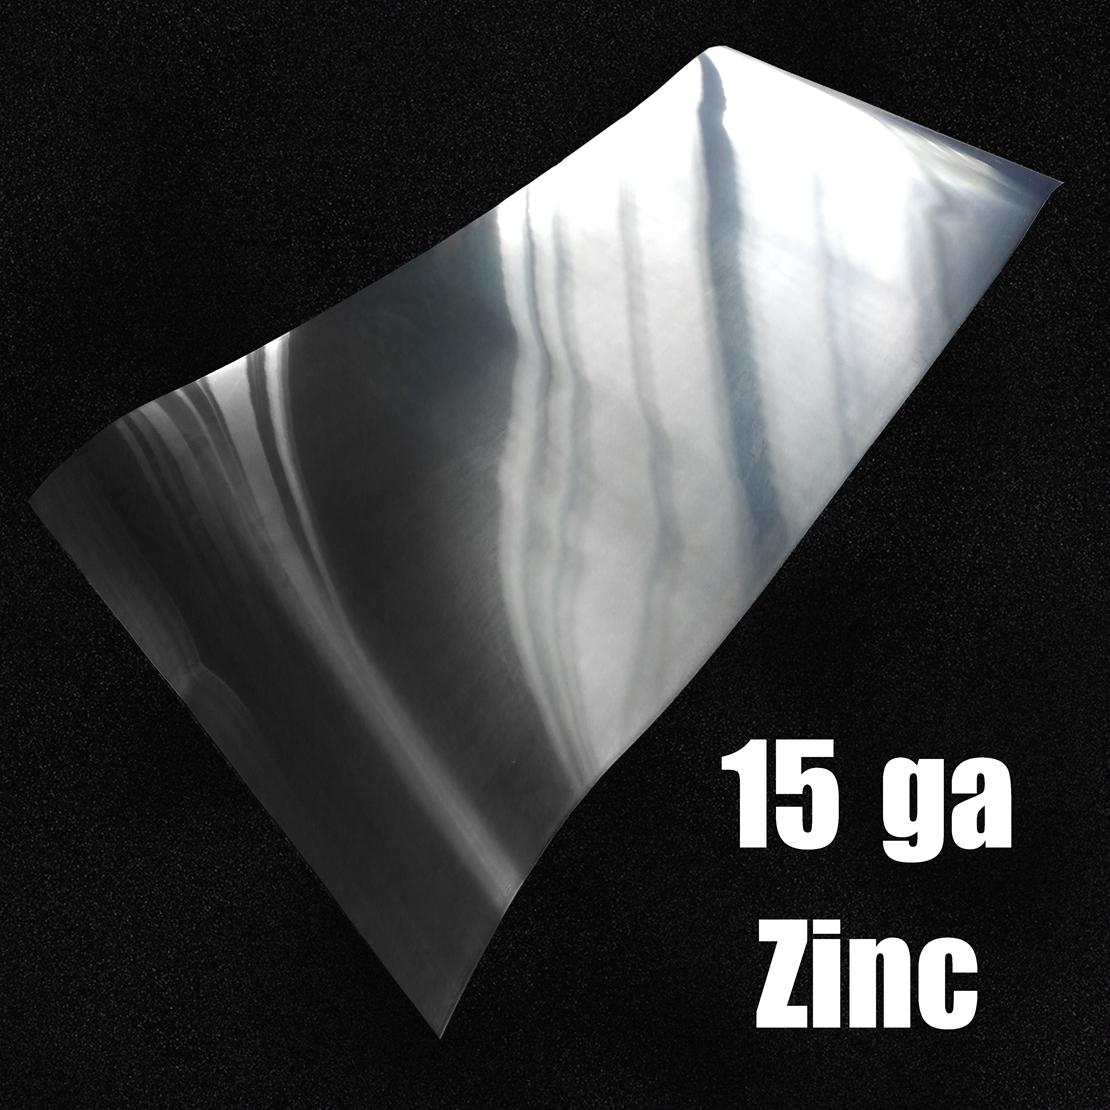 Zinc stock options